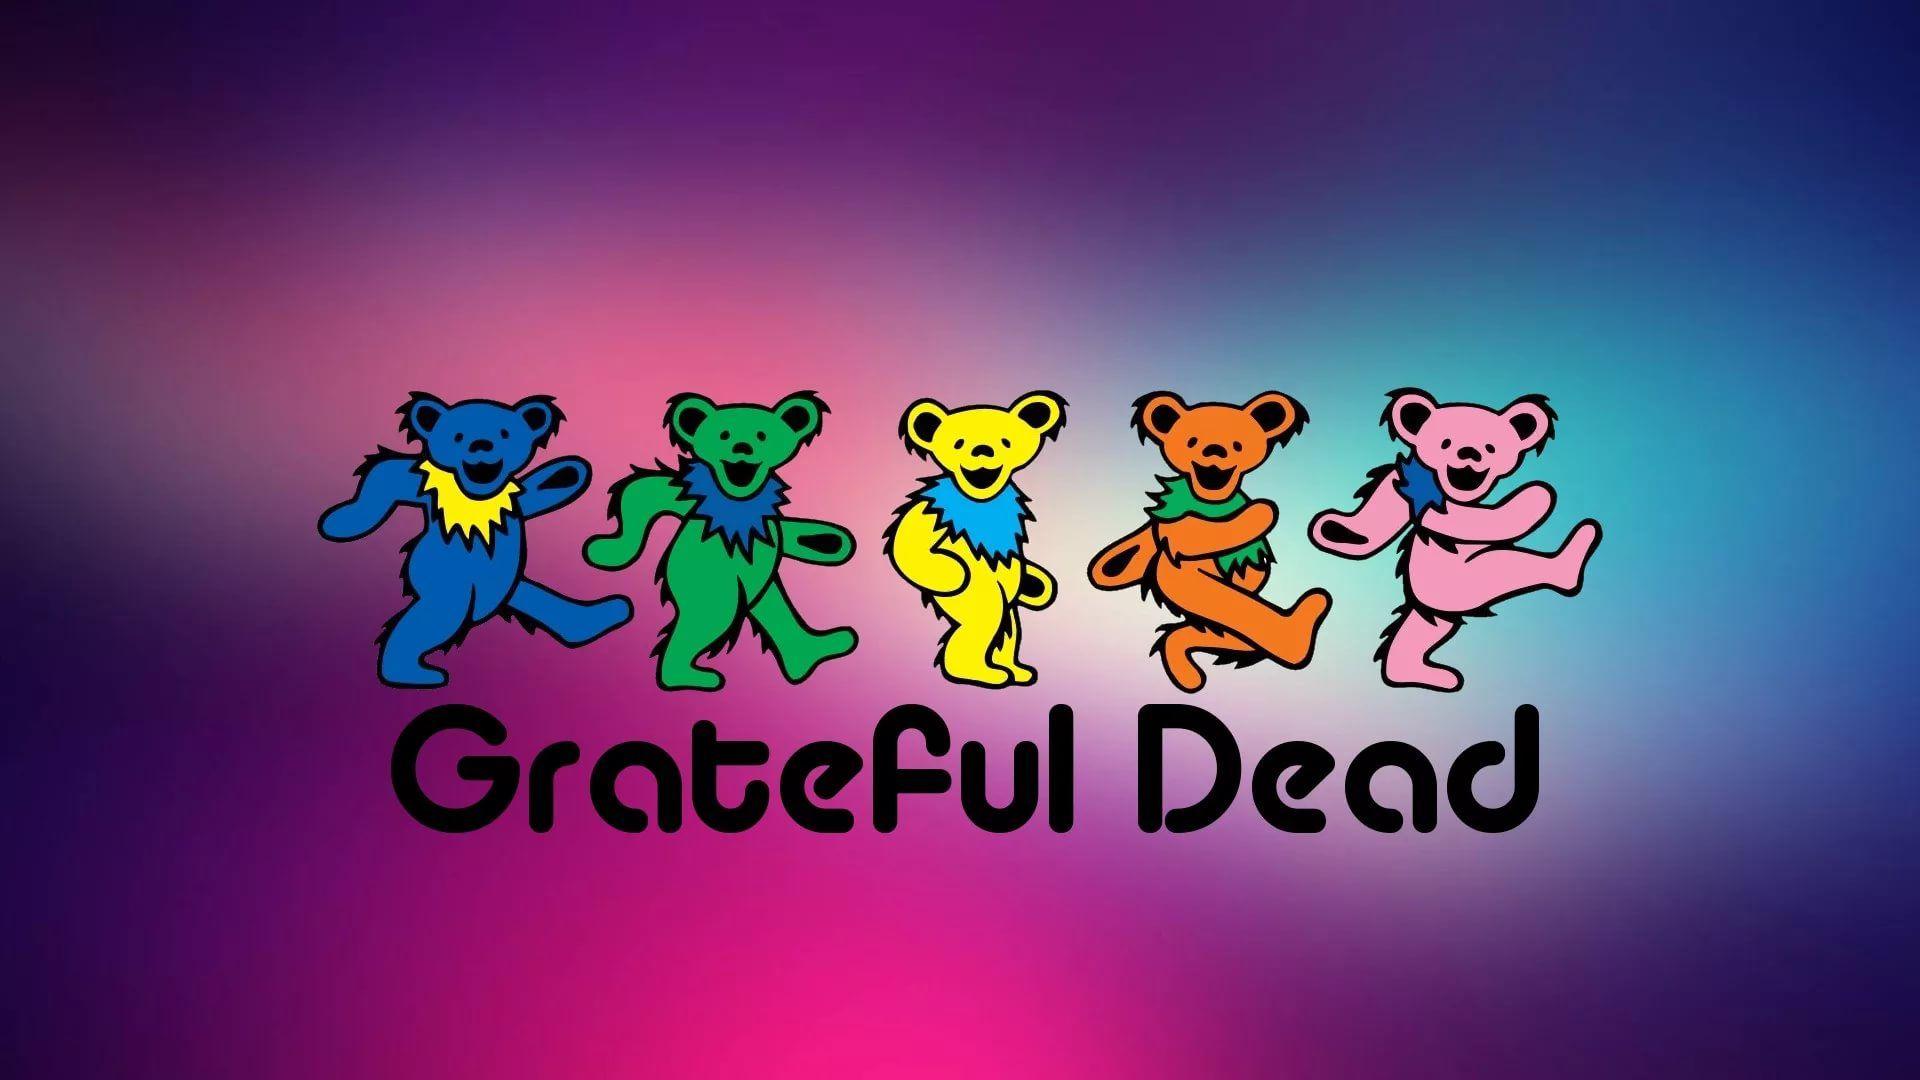 Grateful Dead HD 1080 wallpaper